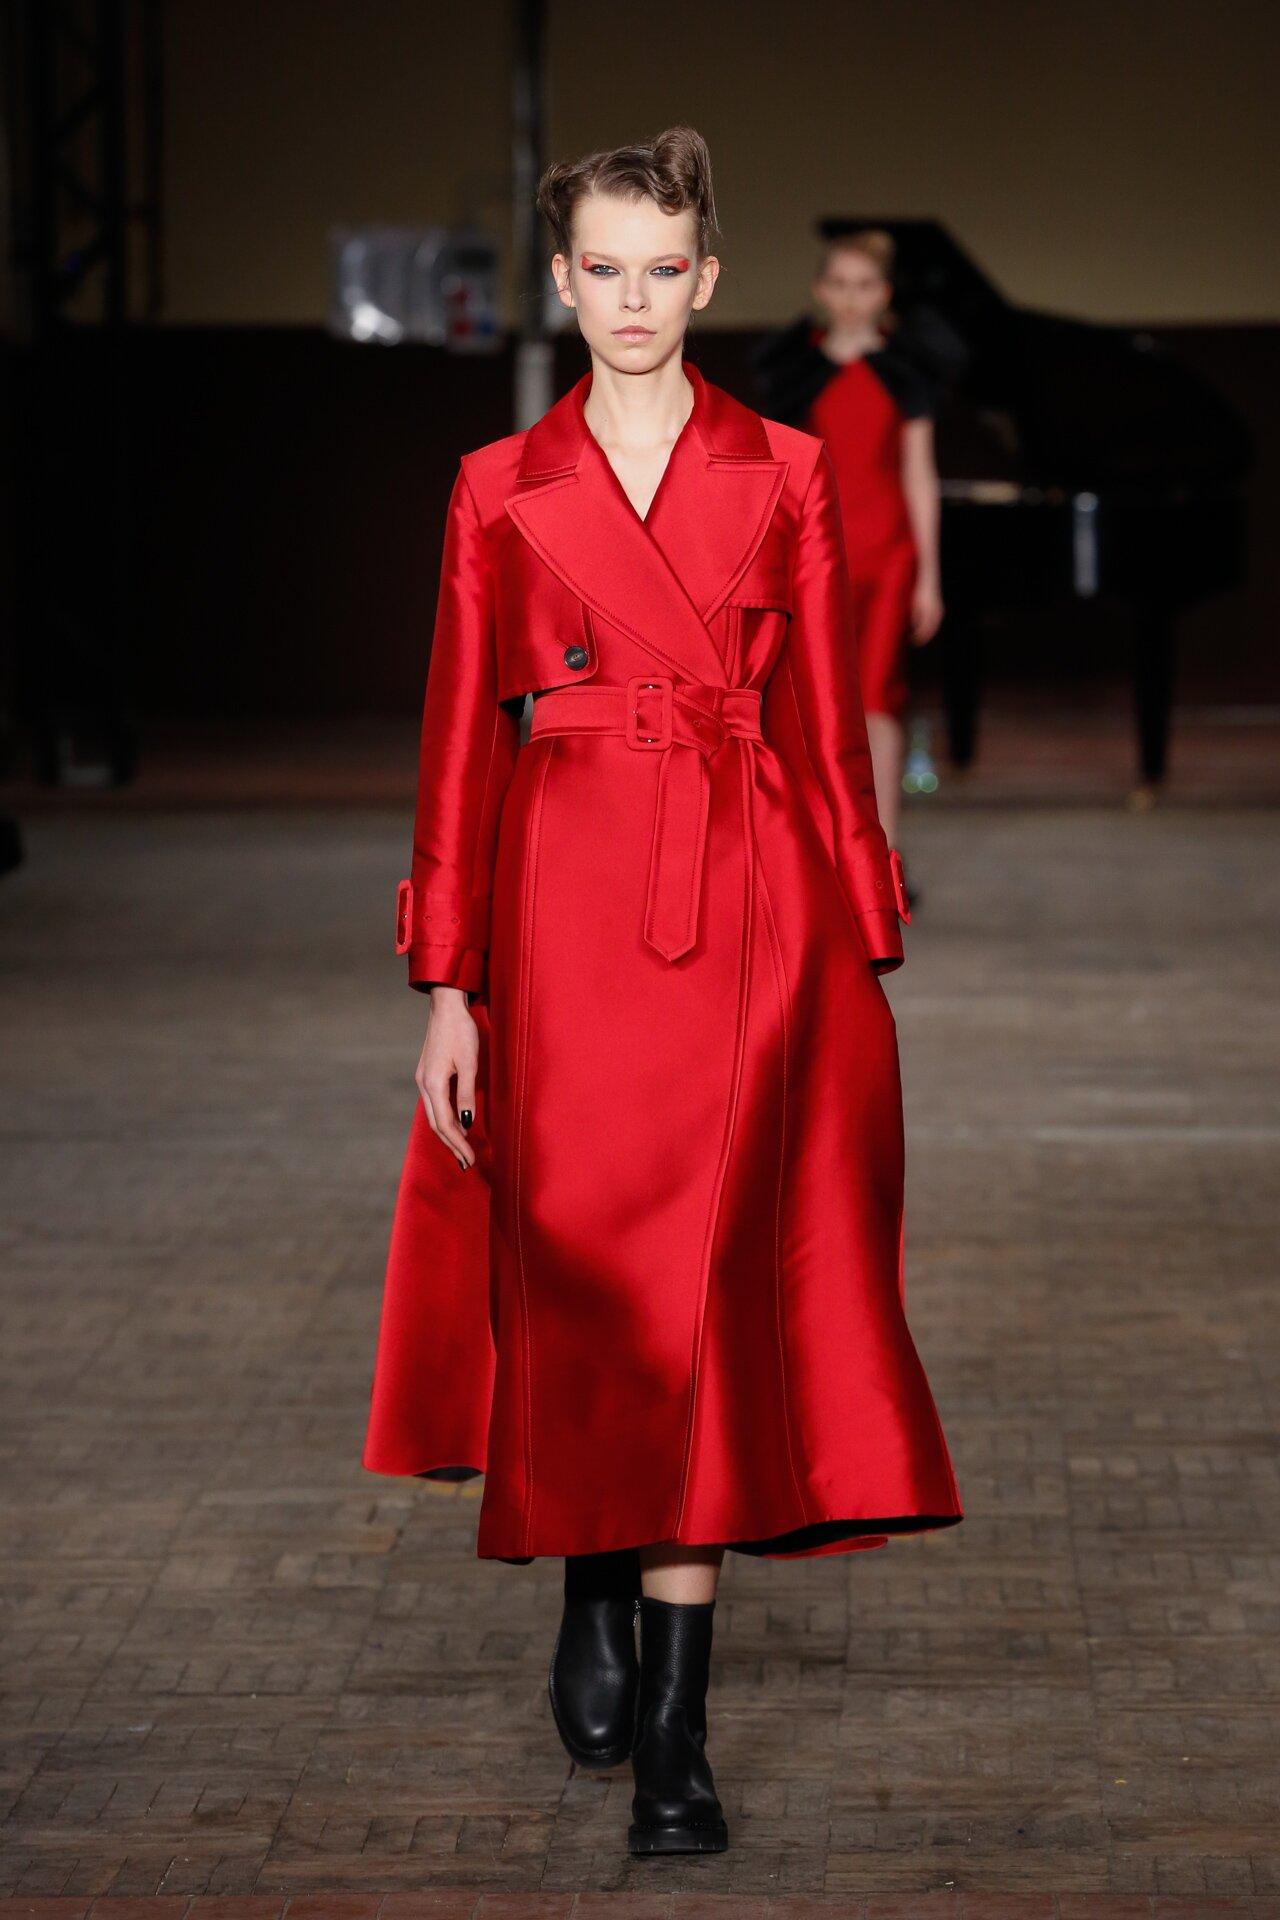 Antonio Marras Fall Winter 2018-19 Fashion Show Look 1